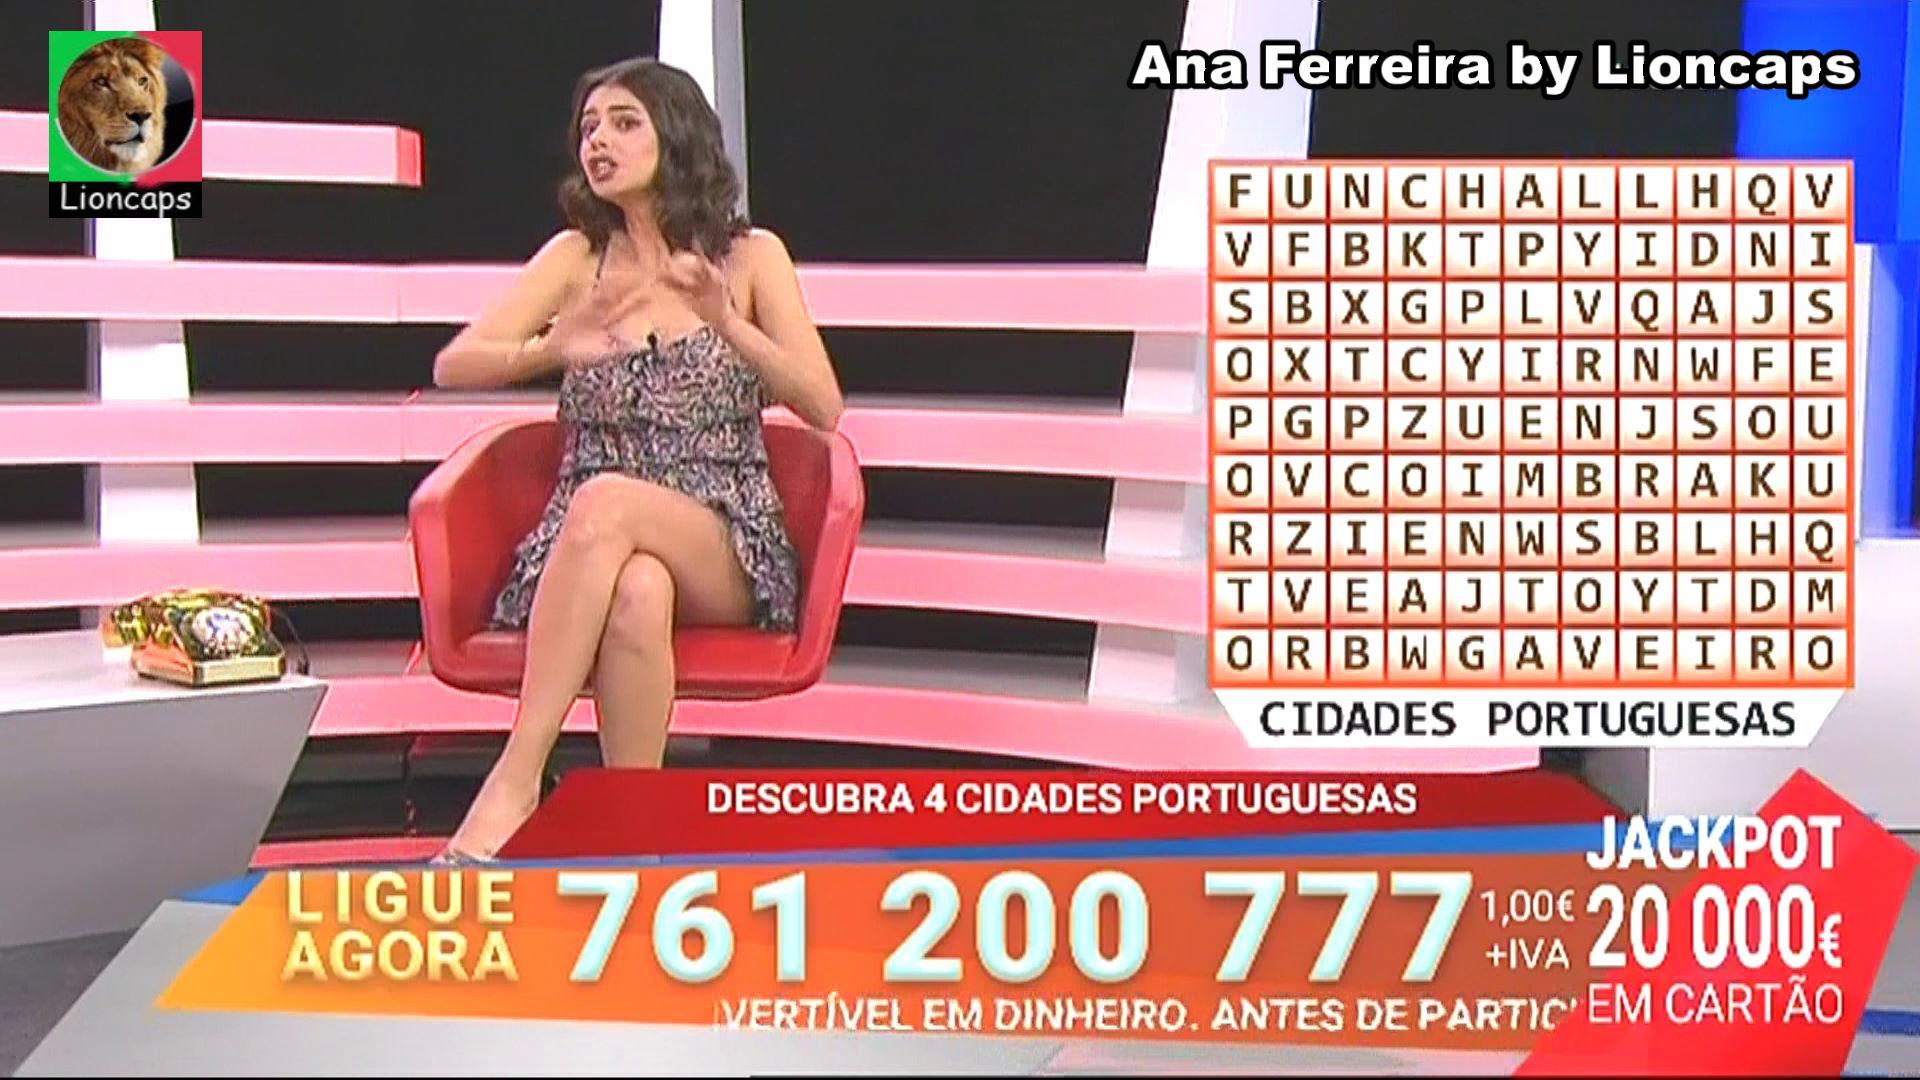 638142764_ana_ferreira_vs200225_0757_122_487lo.JPG